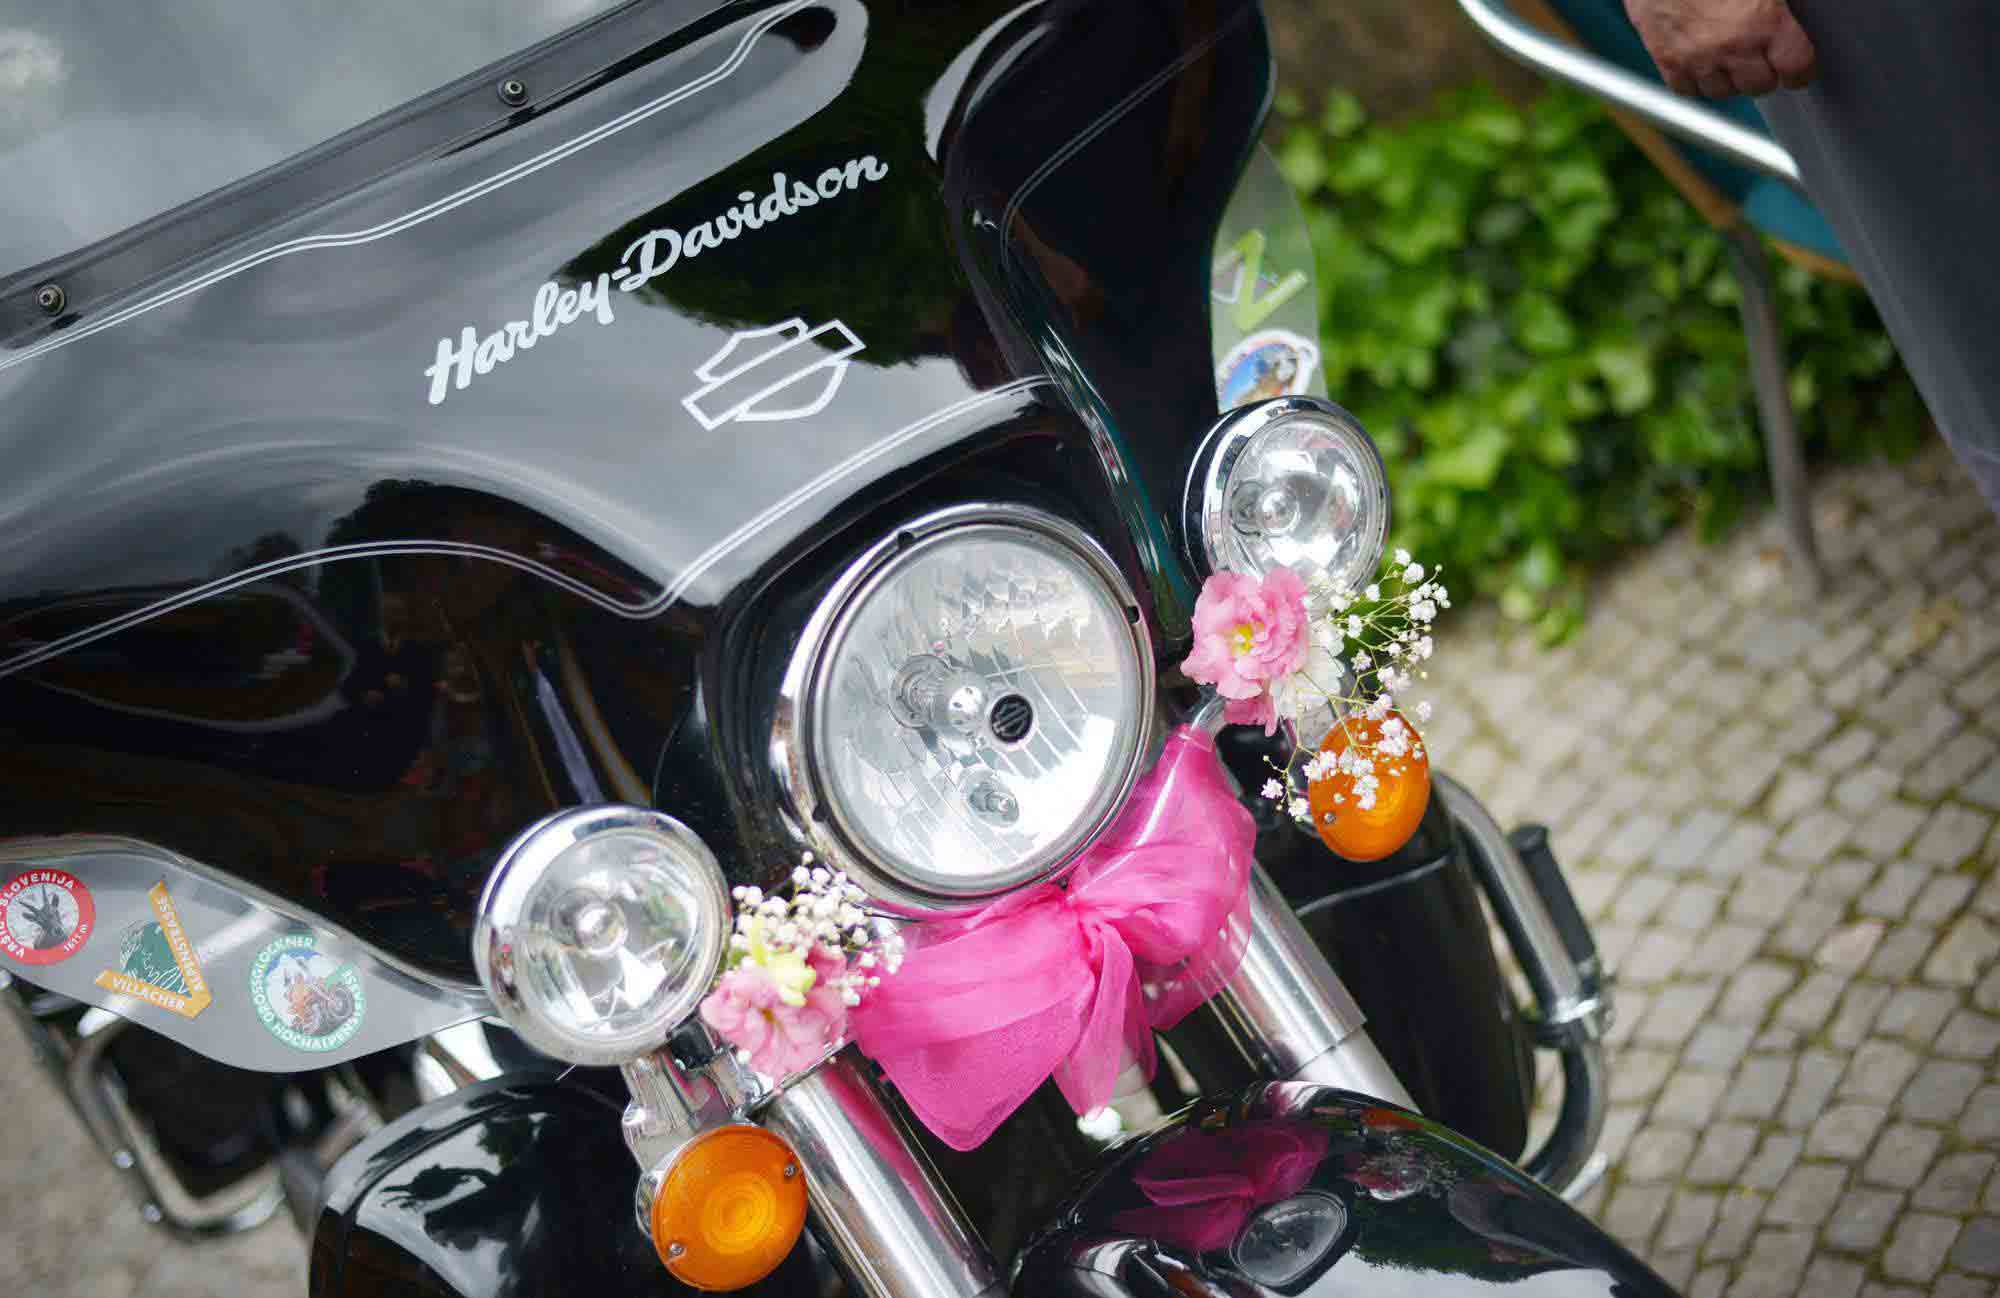 Svatebni vyzdoba na motorku